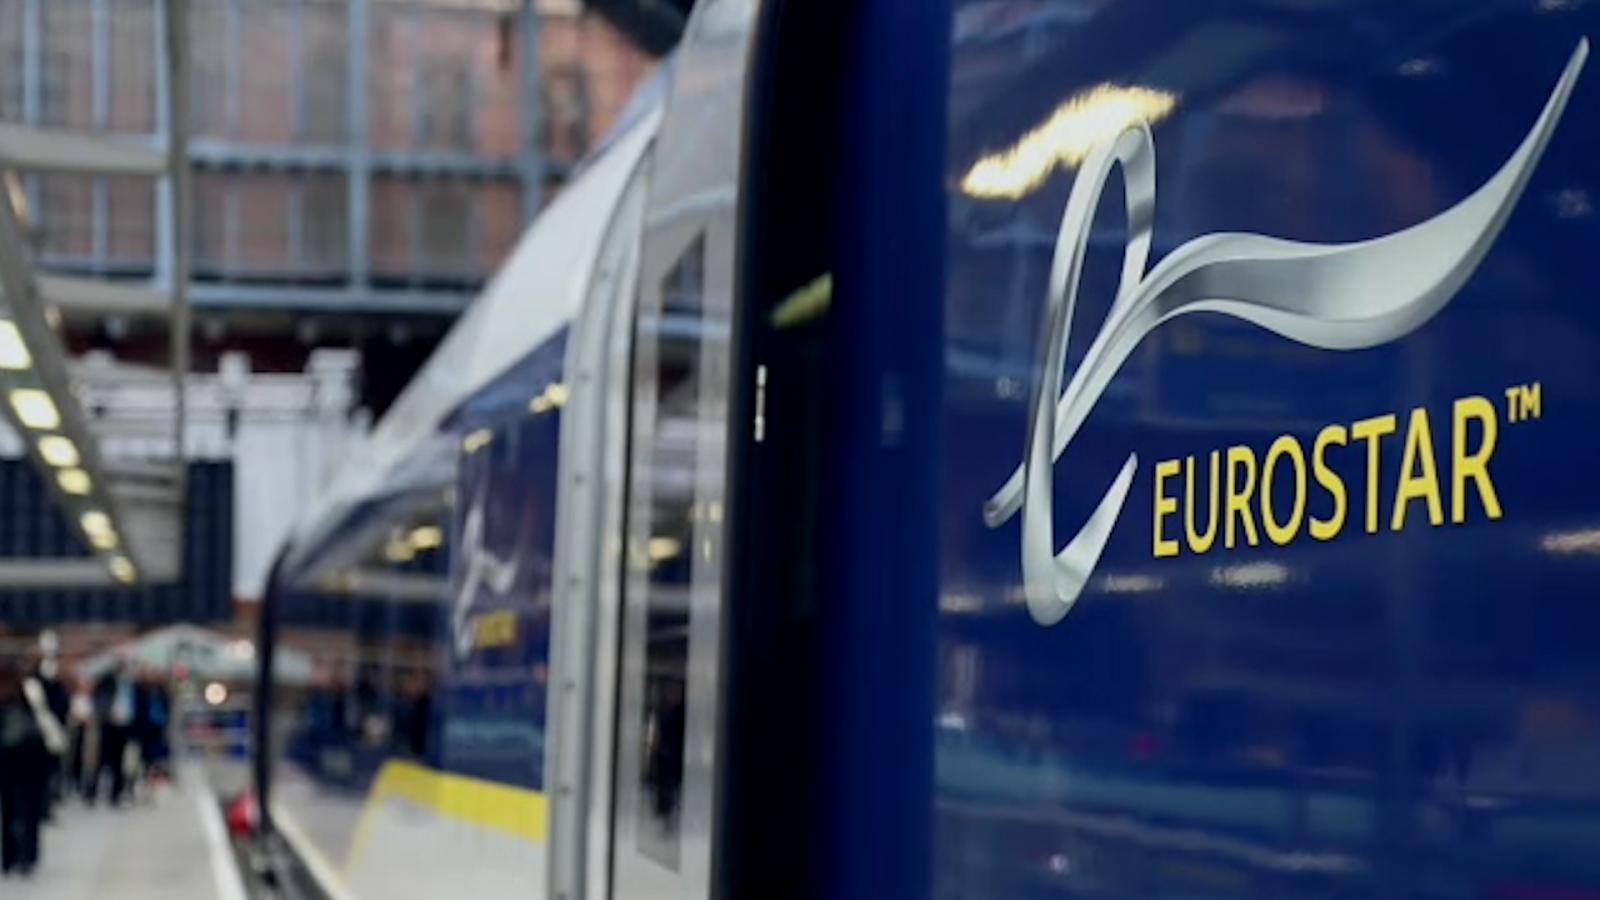 Eurostar closed due to power fault